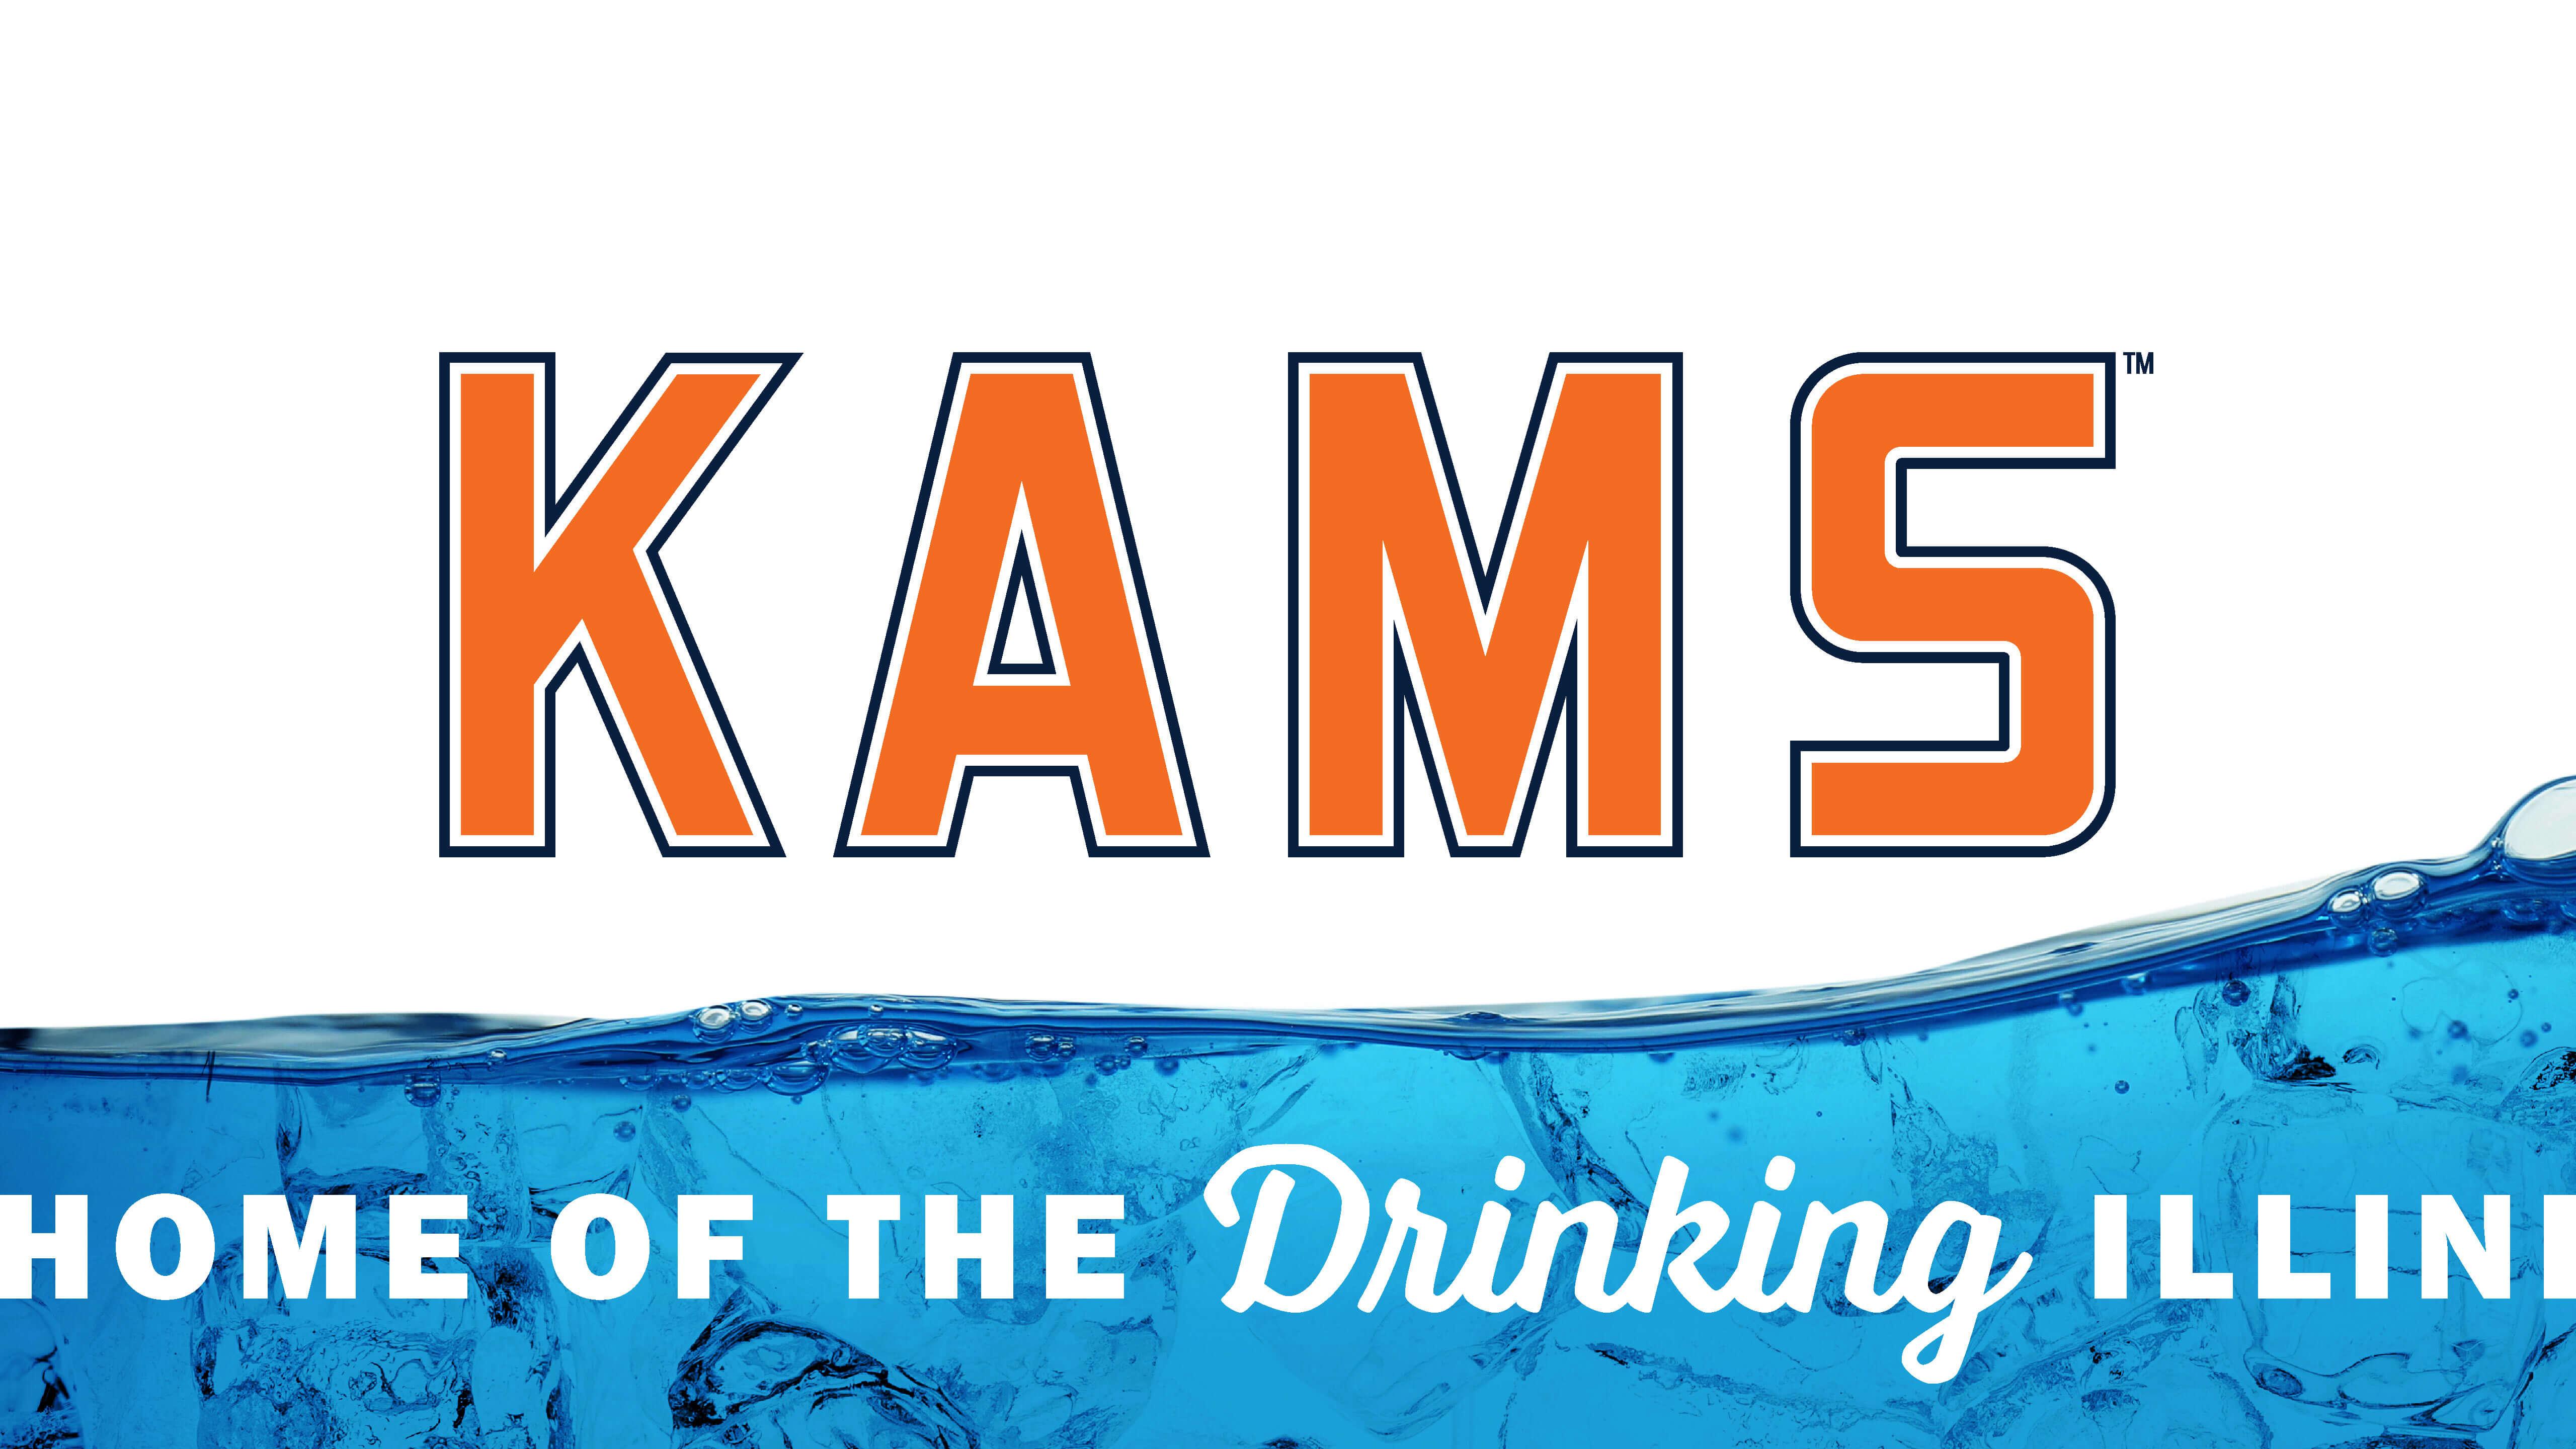 KAMS Branding, Signage, and Apparel